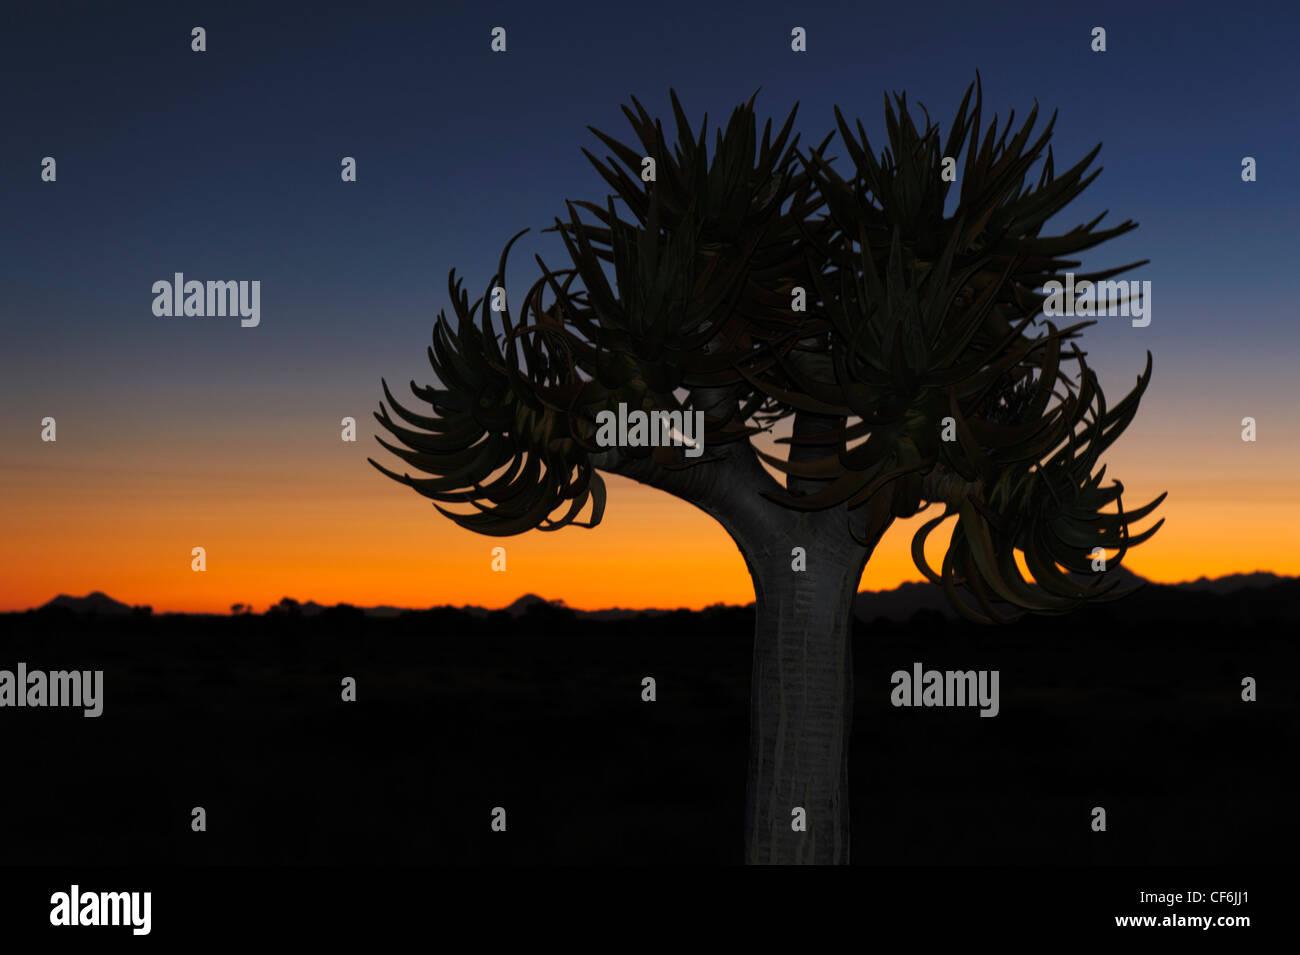 Qiuver tree (Aloe dichotoma) au coucher du soleil, Désert du Namib, Namibie. Photo Stock